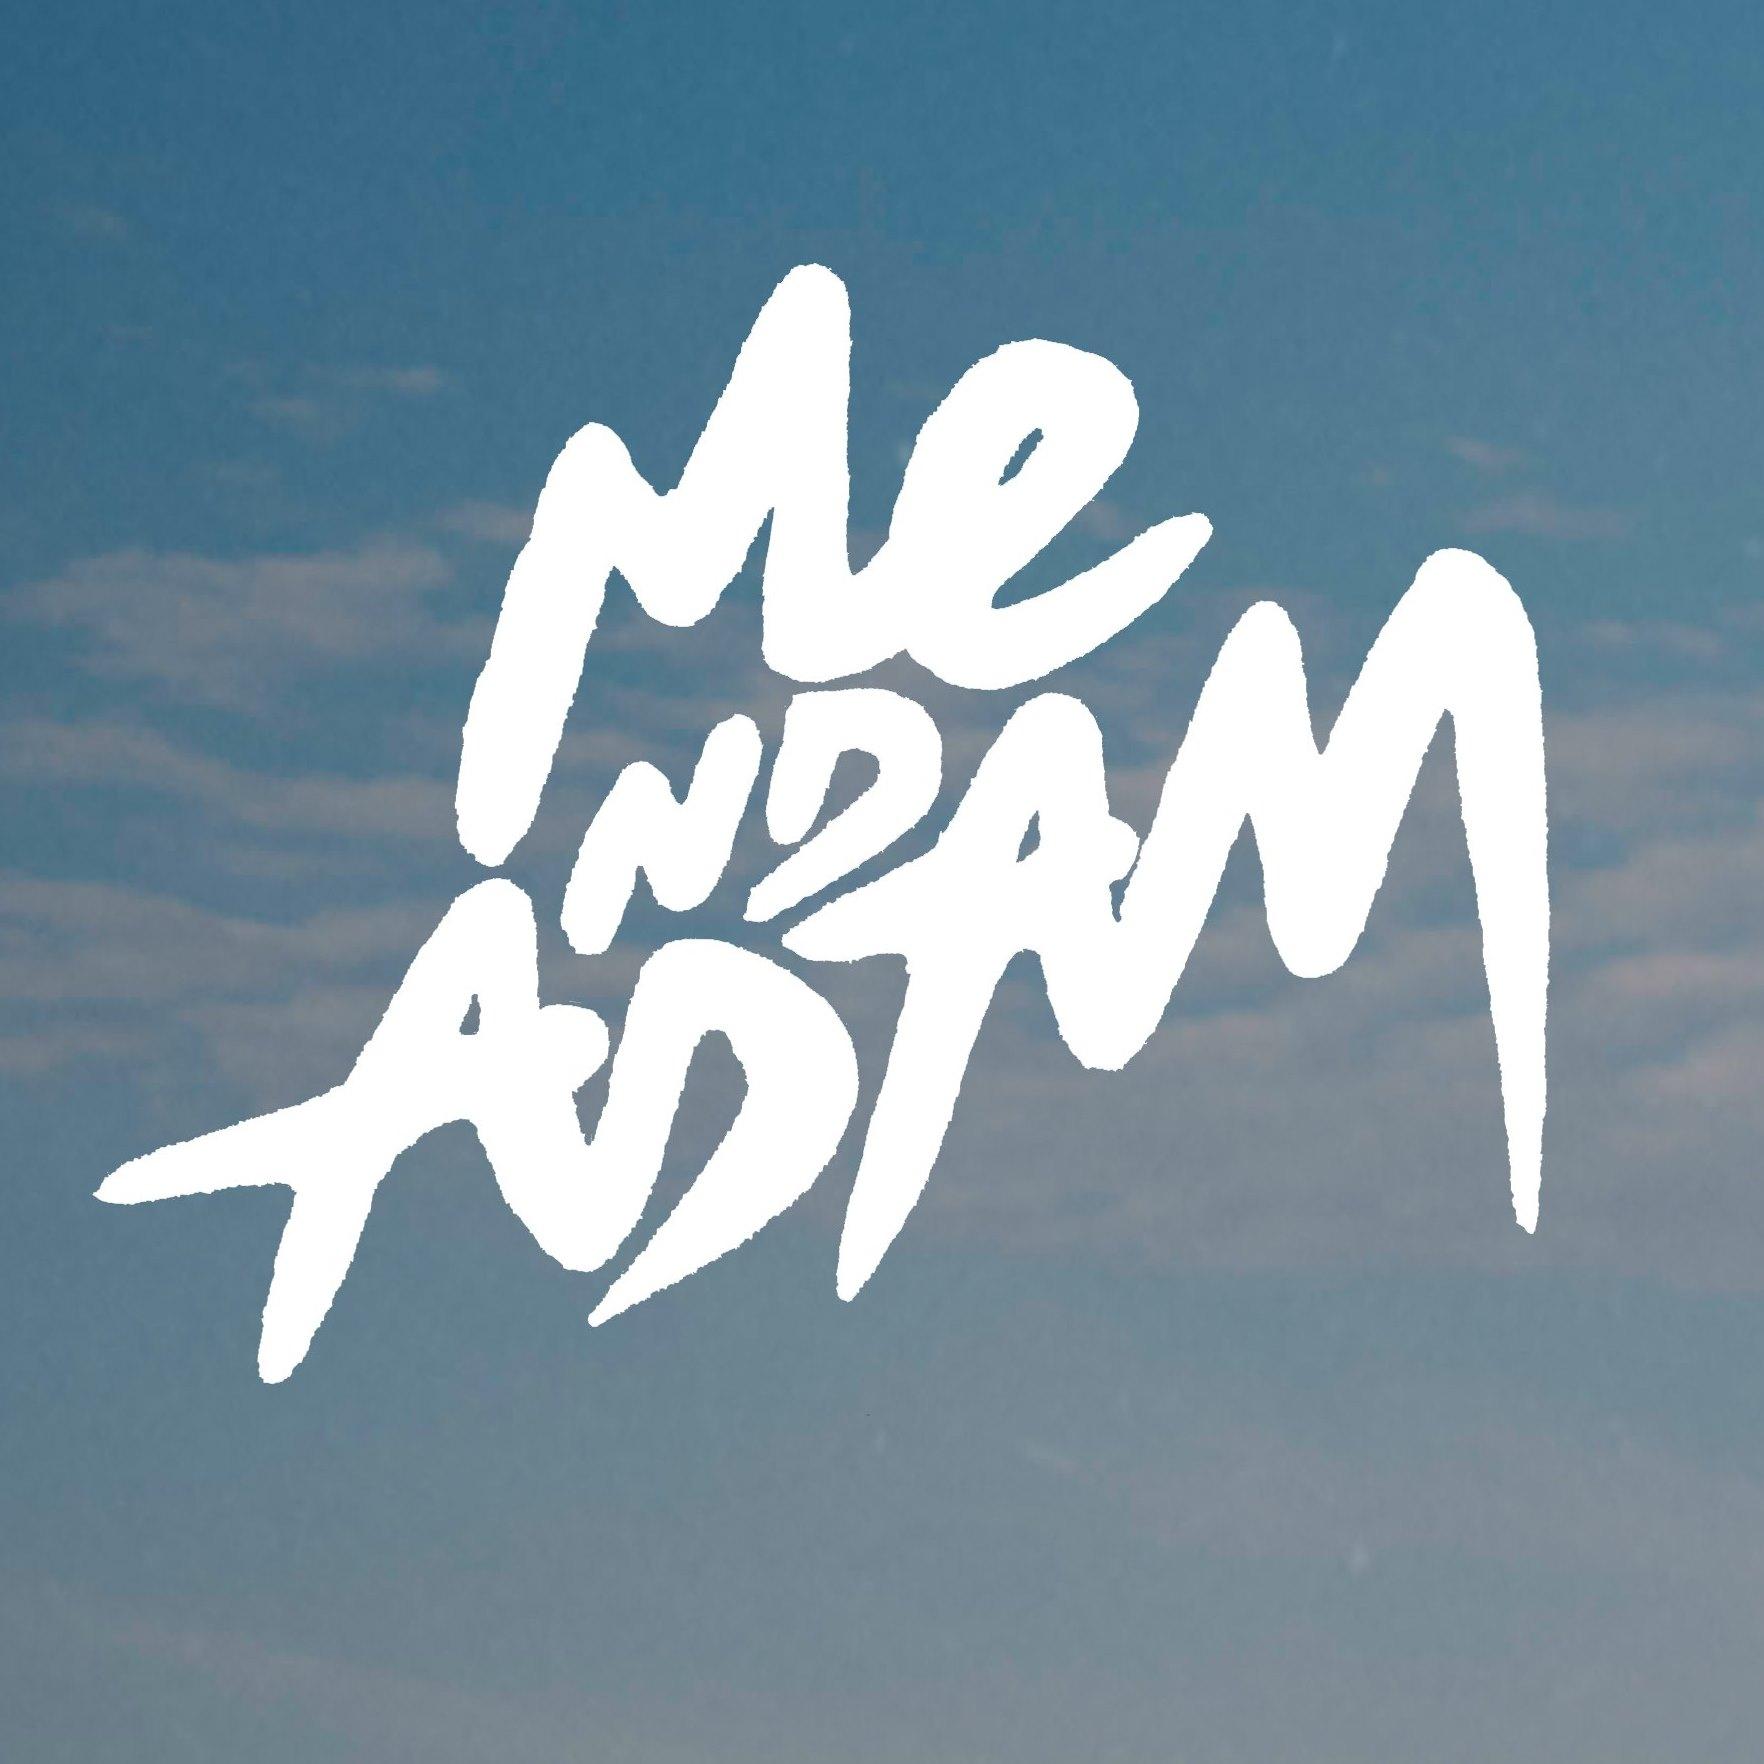 Me Nd Adam: